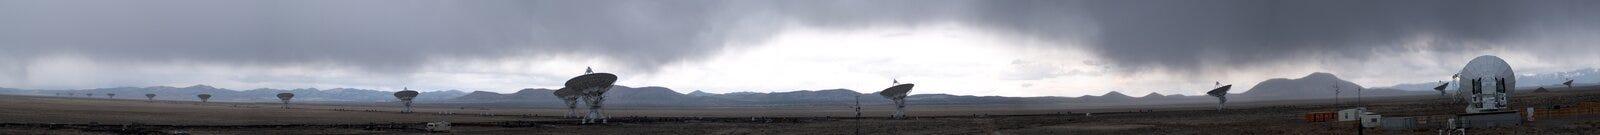 Anteny szyka ulewy panorama Fotografia Stock